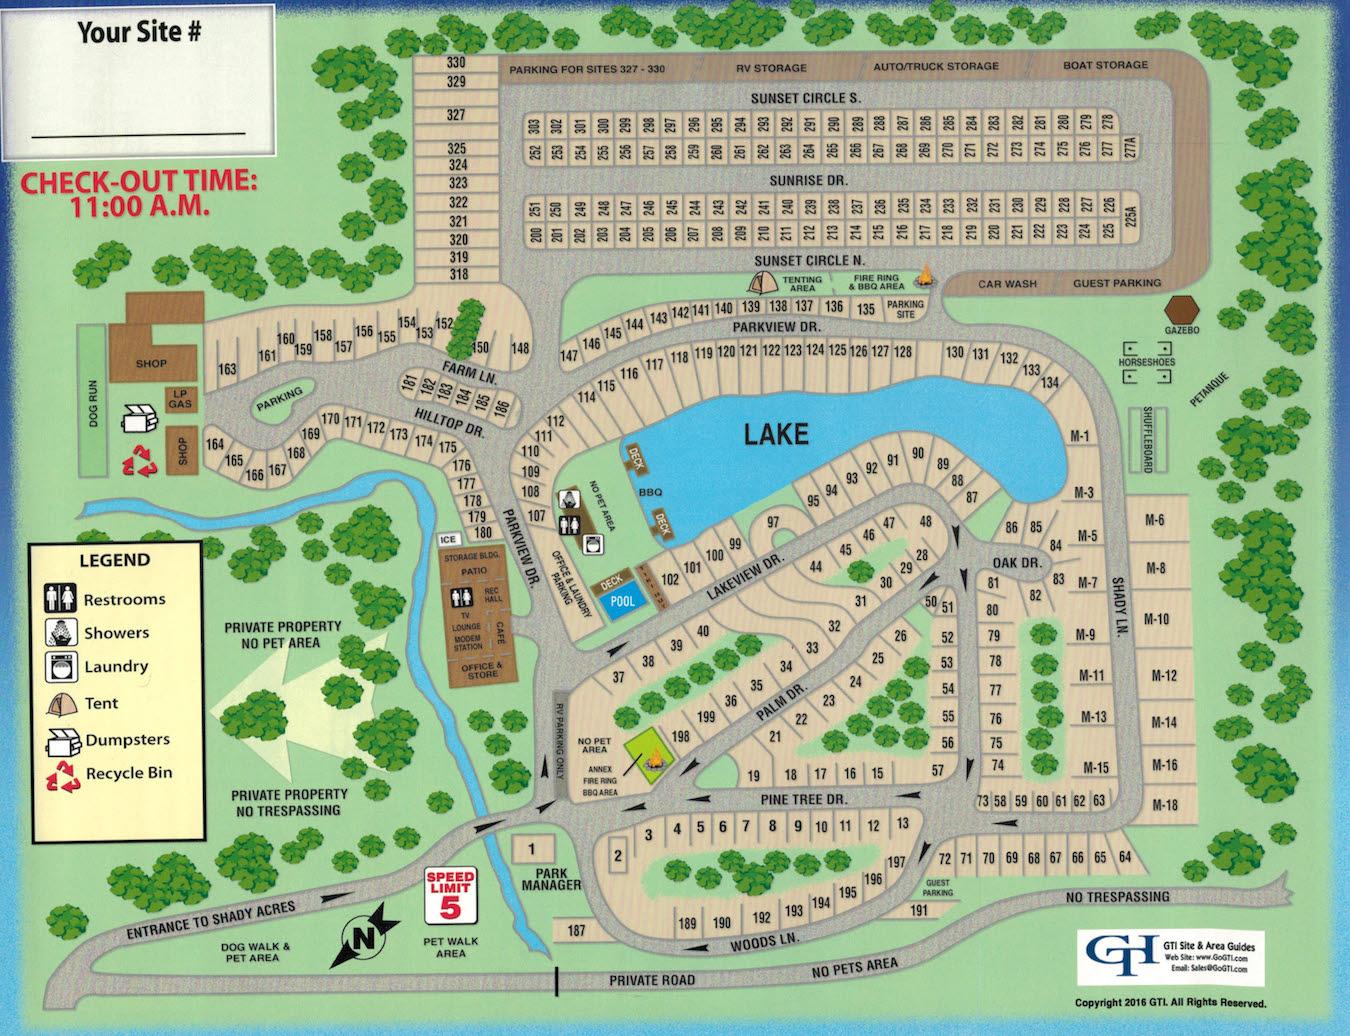 Shady Acres Rv And Camping Park - Park Map - Florida Camping Map